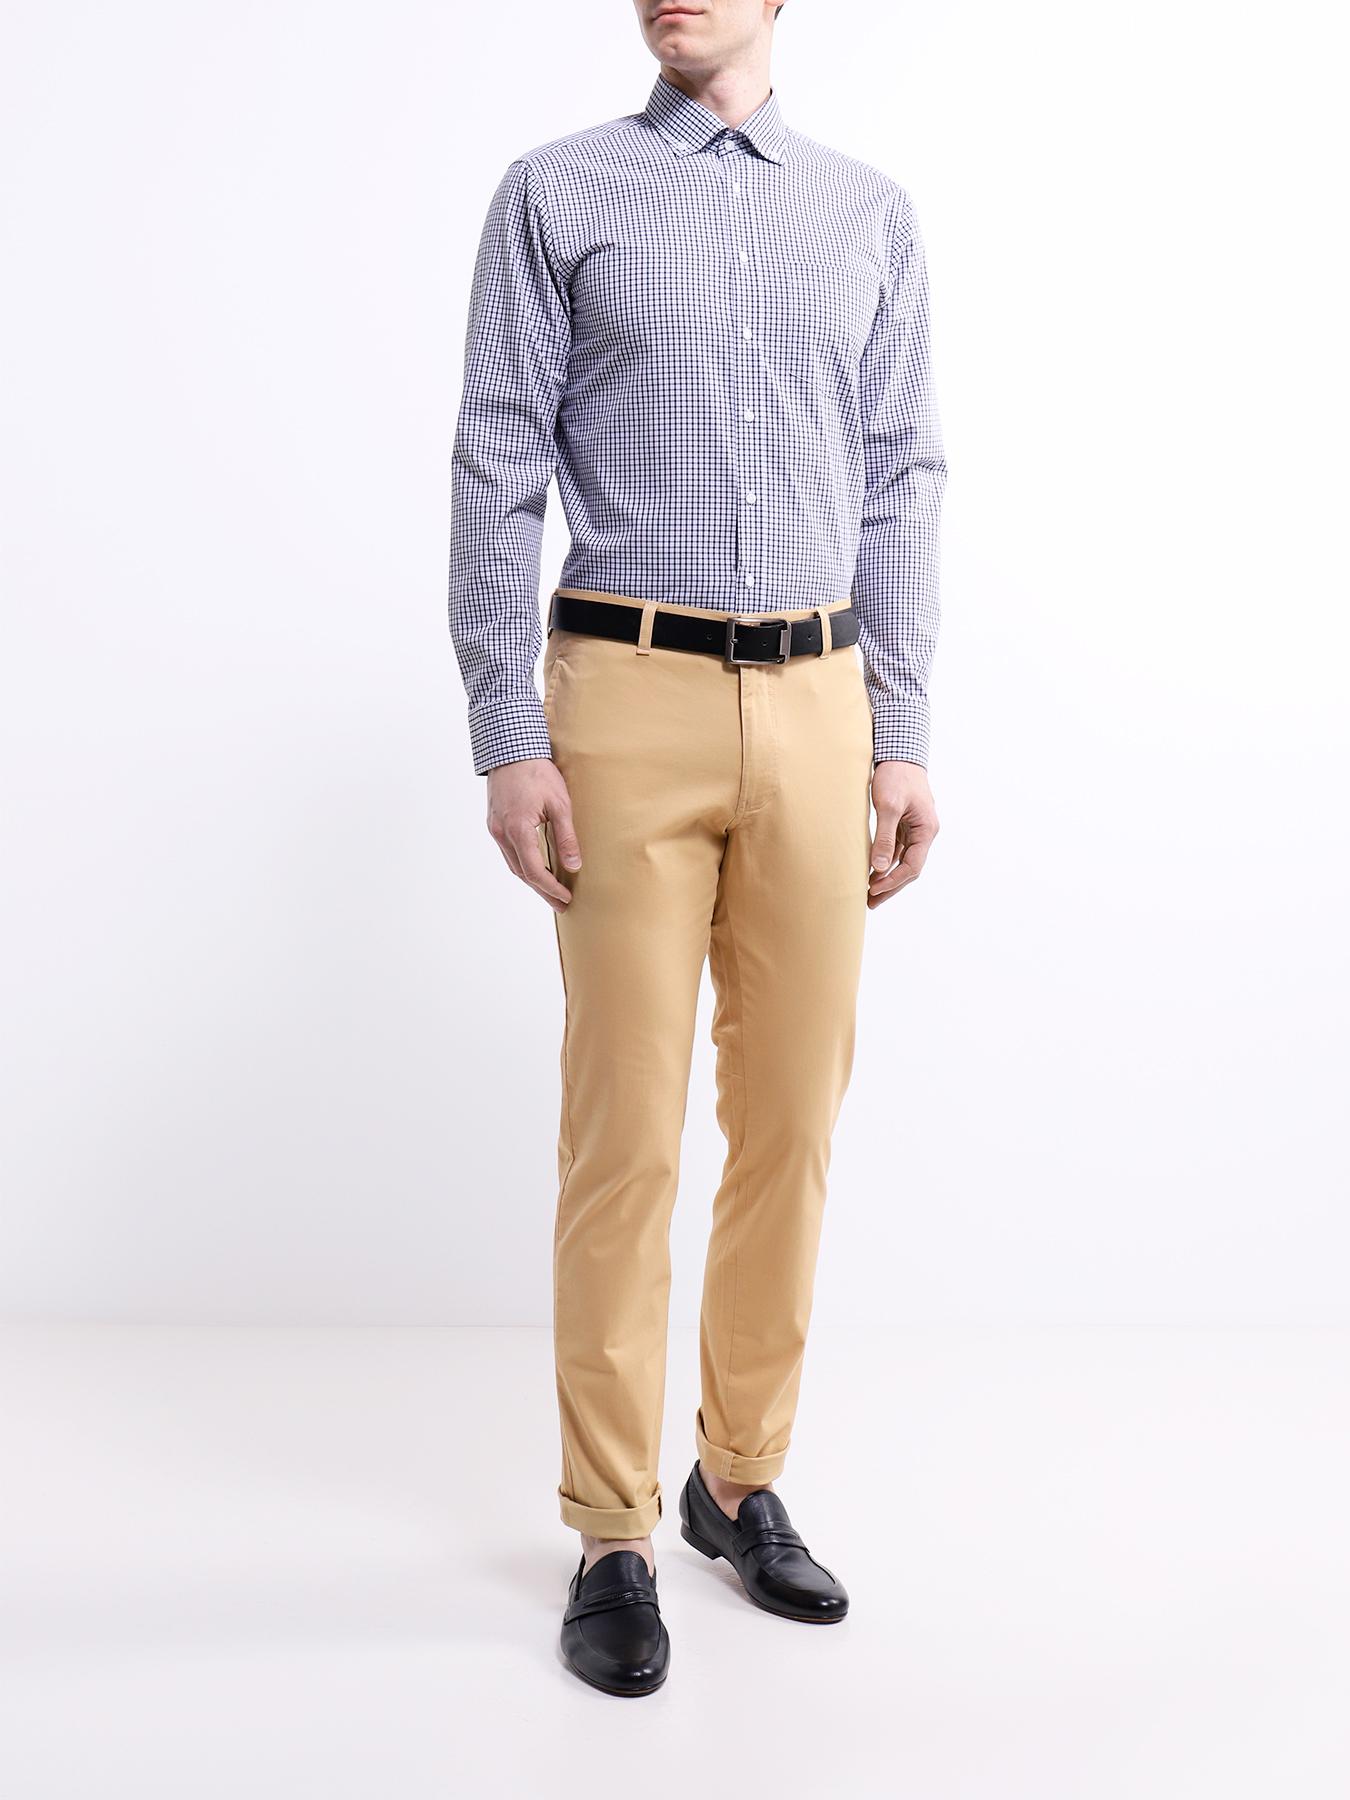 Брюки Ritter Jeans Брюки брюки ritter jeans прямые джинсы